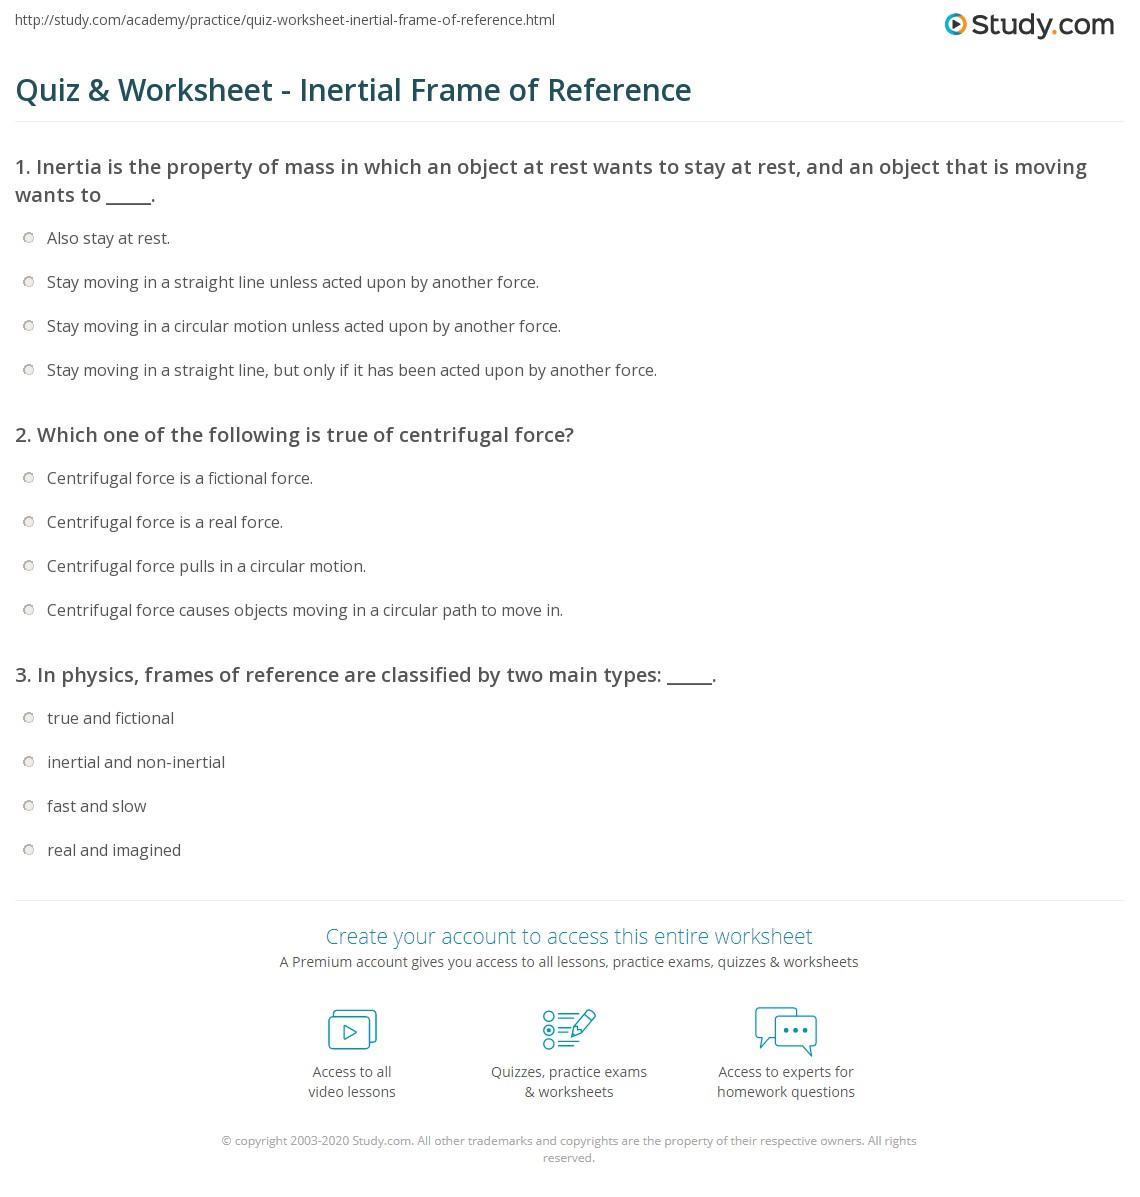 Quiz & Worksheet - Inertial Frame of Reference | Study.com